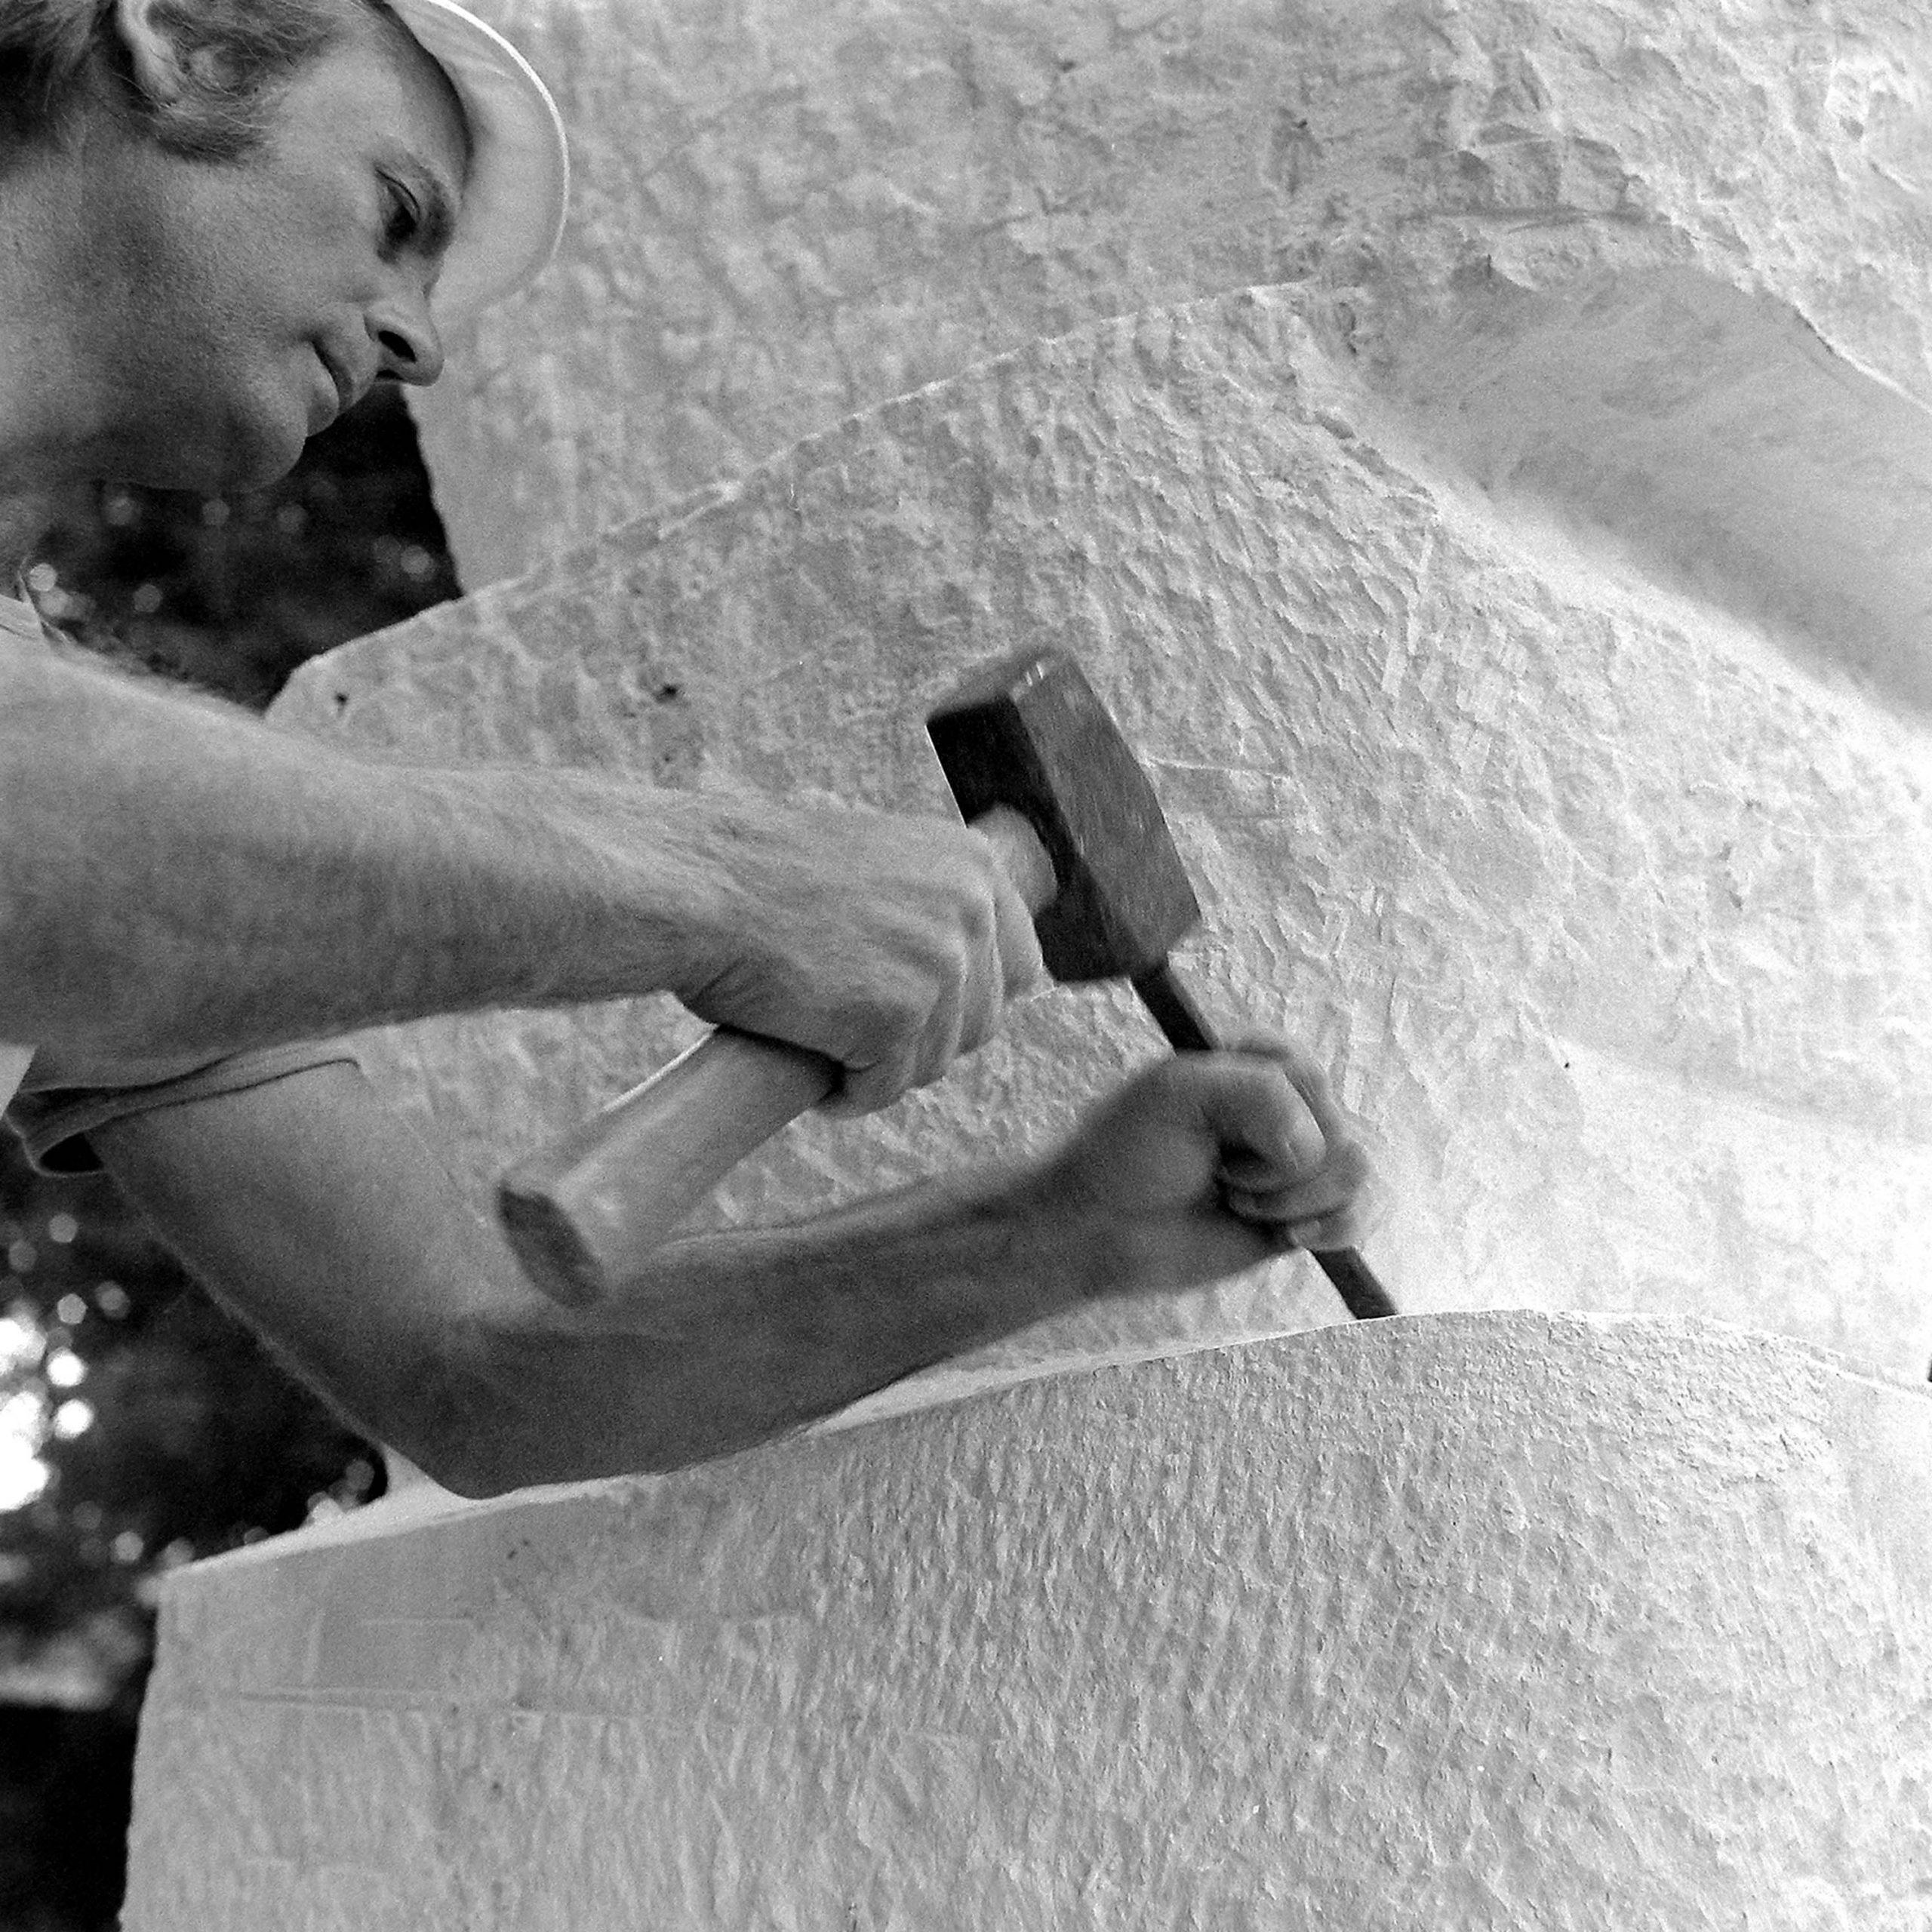 Šime Vulas, Sails, 1975